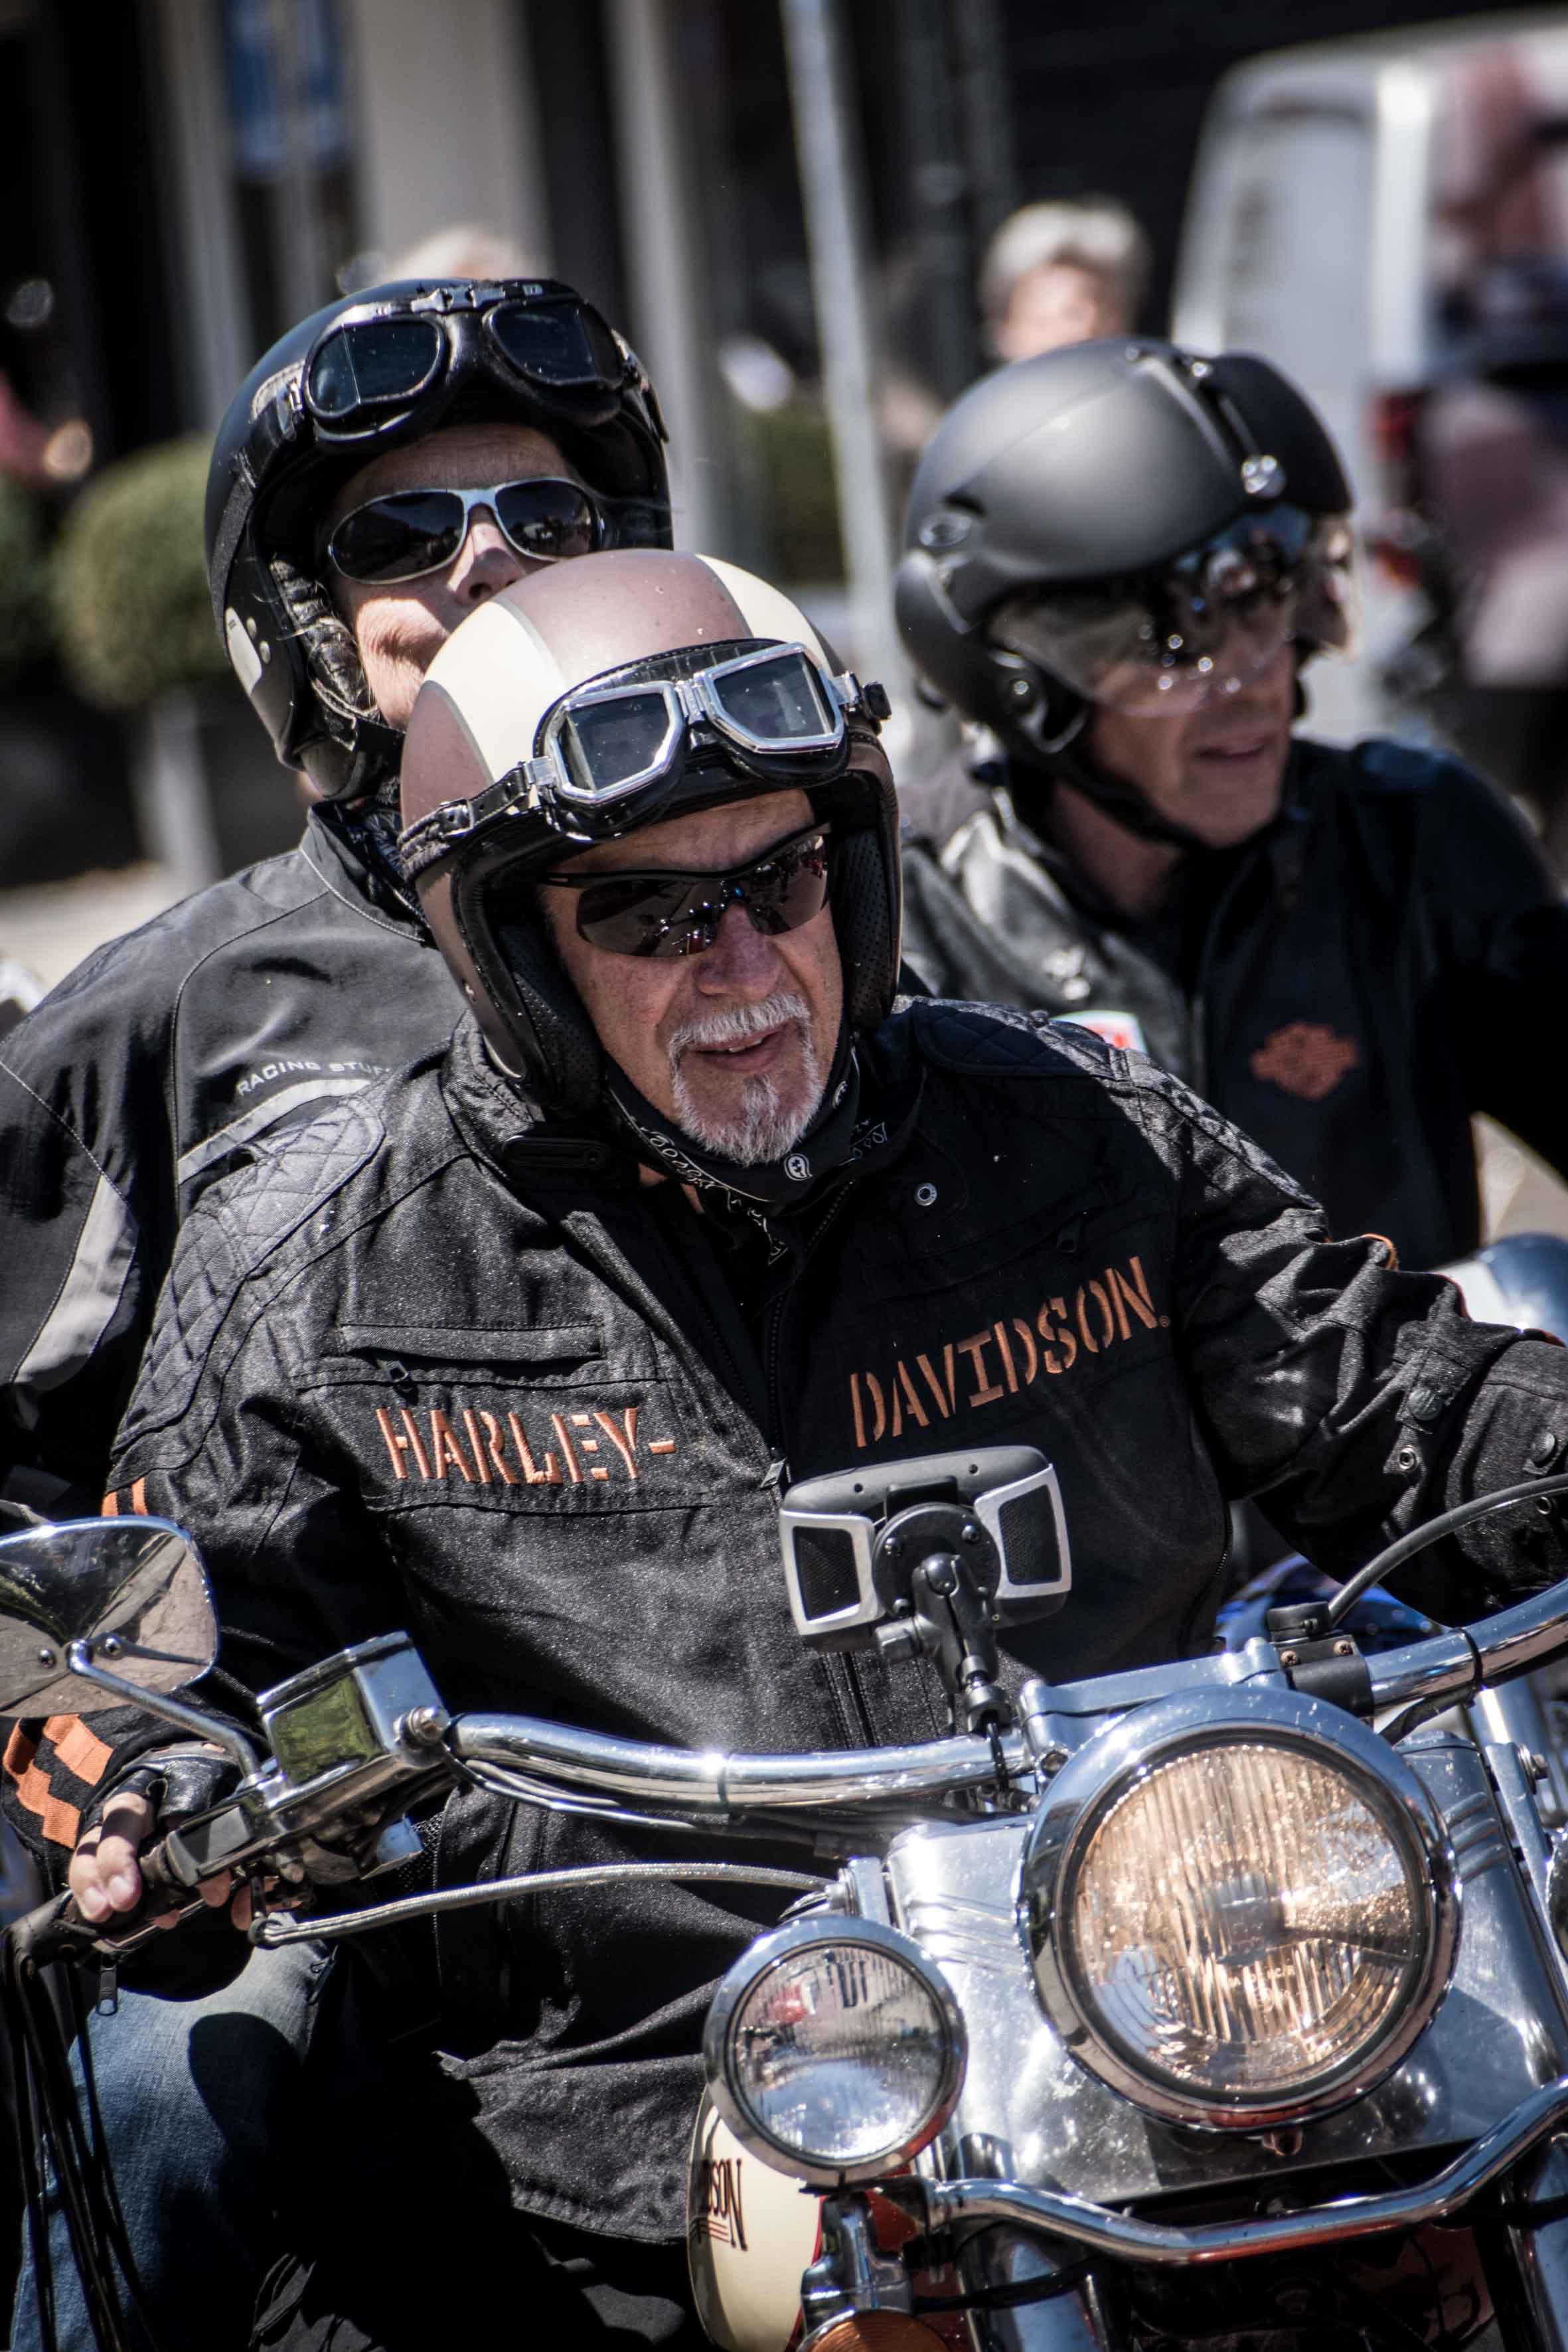 180701 Harley Davidson small-09264